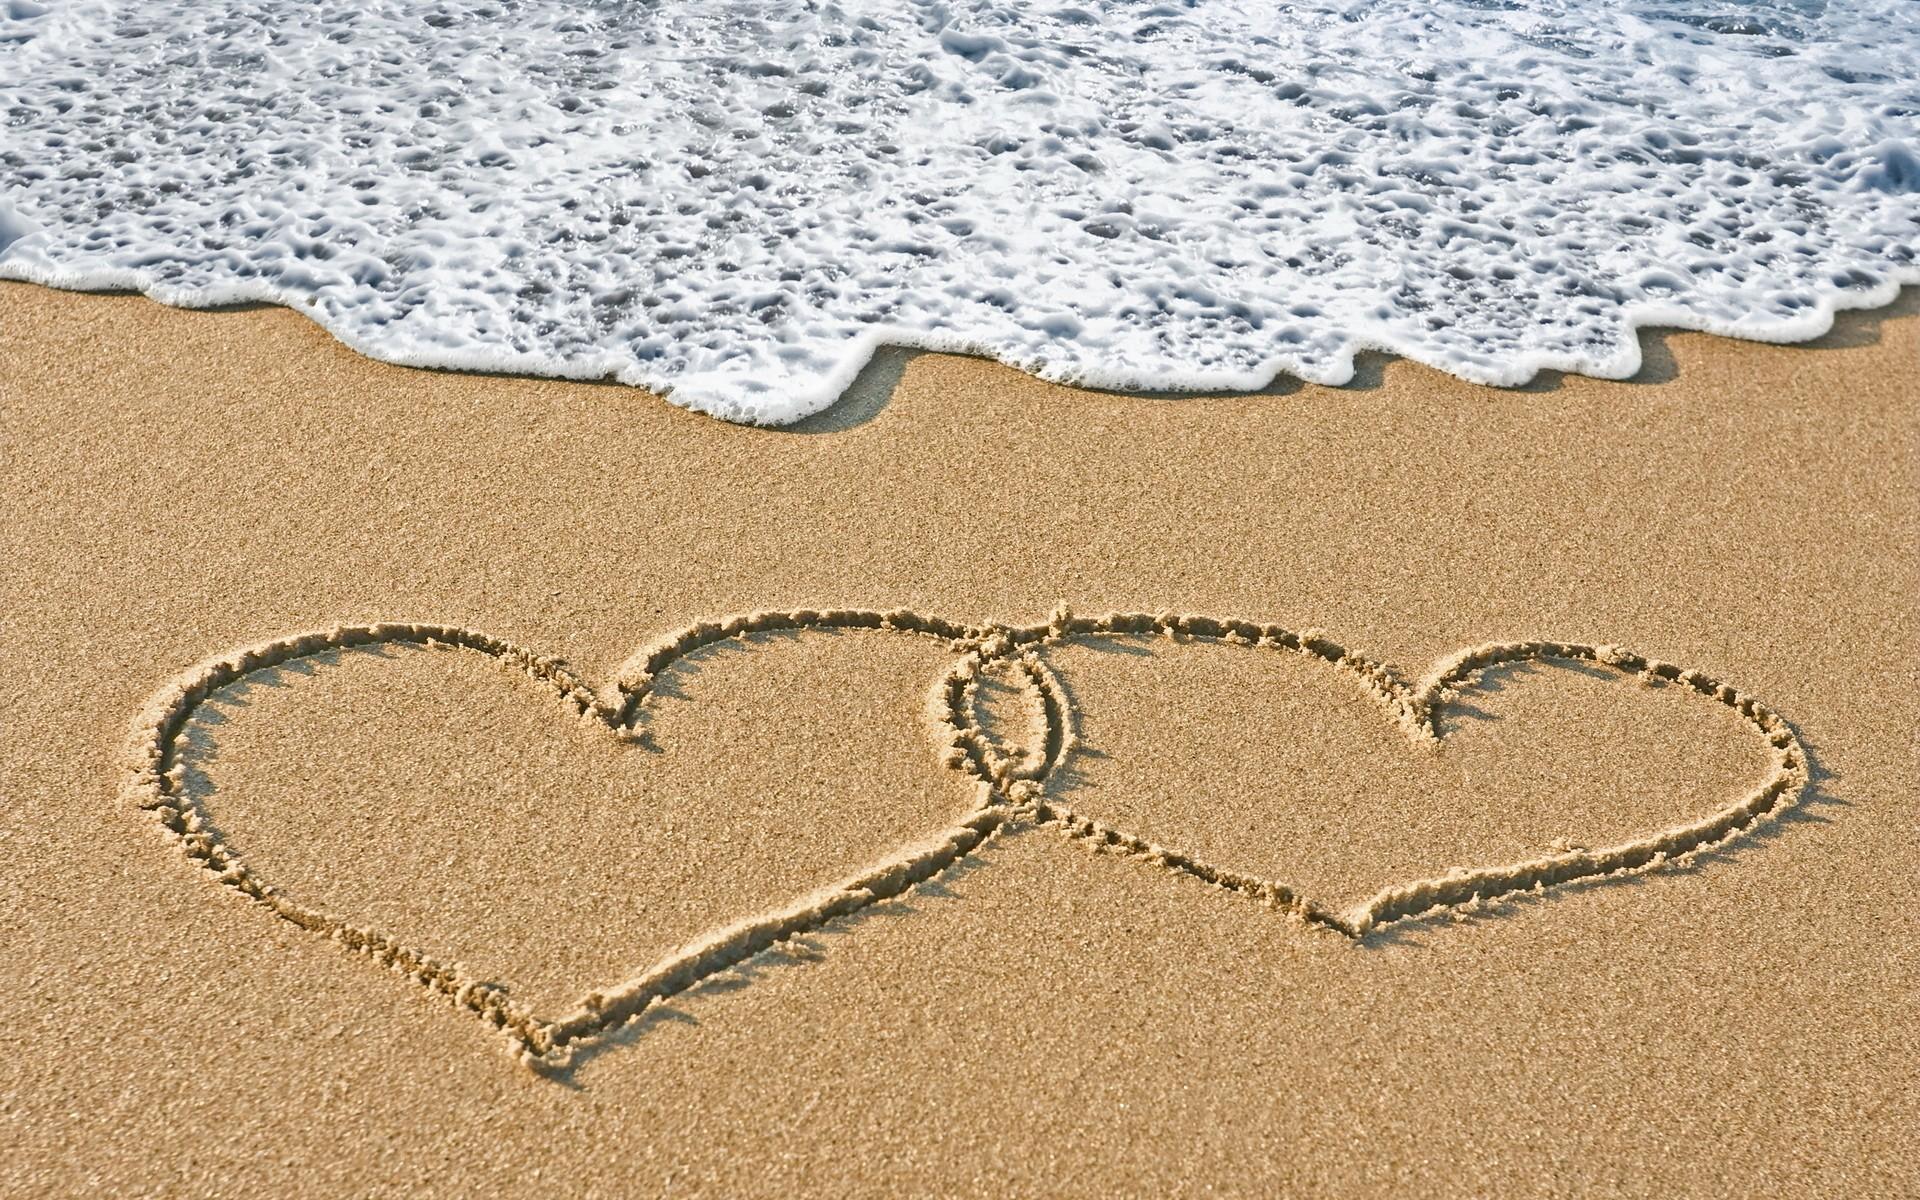 Corazones en la playa - 1920x1200